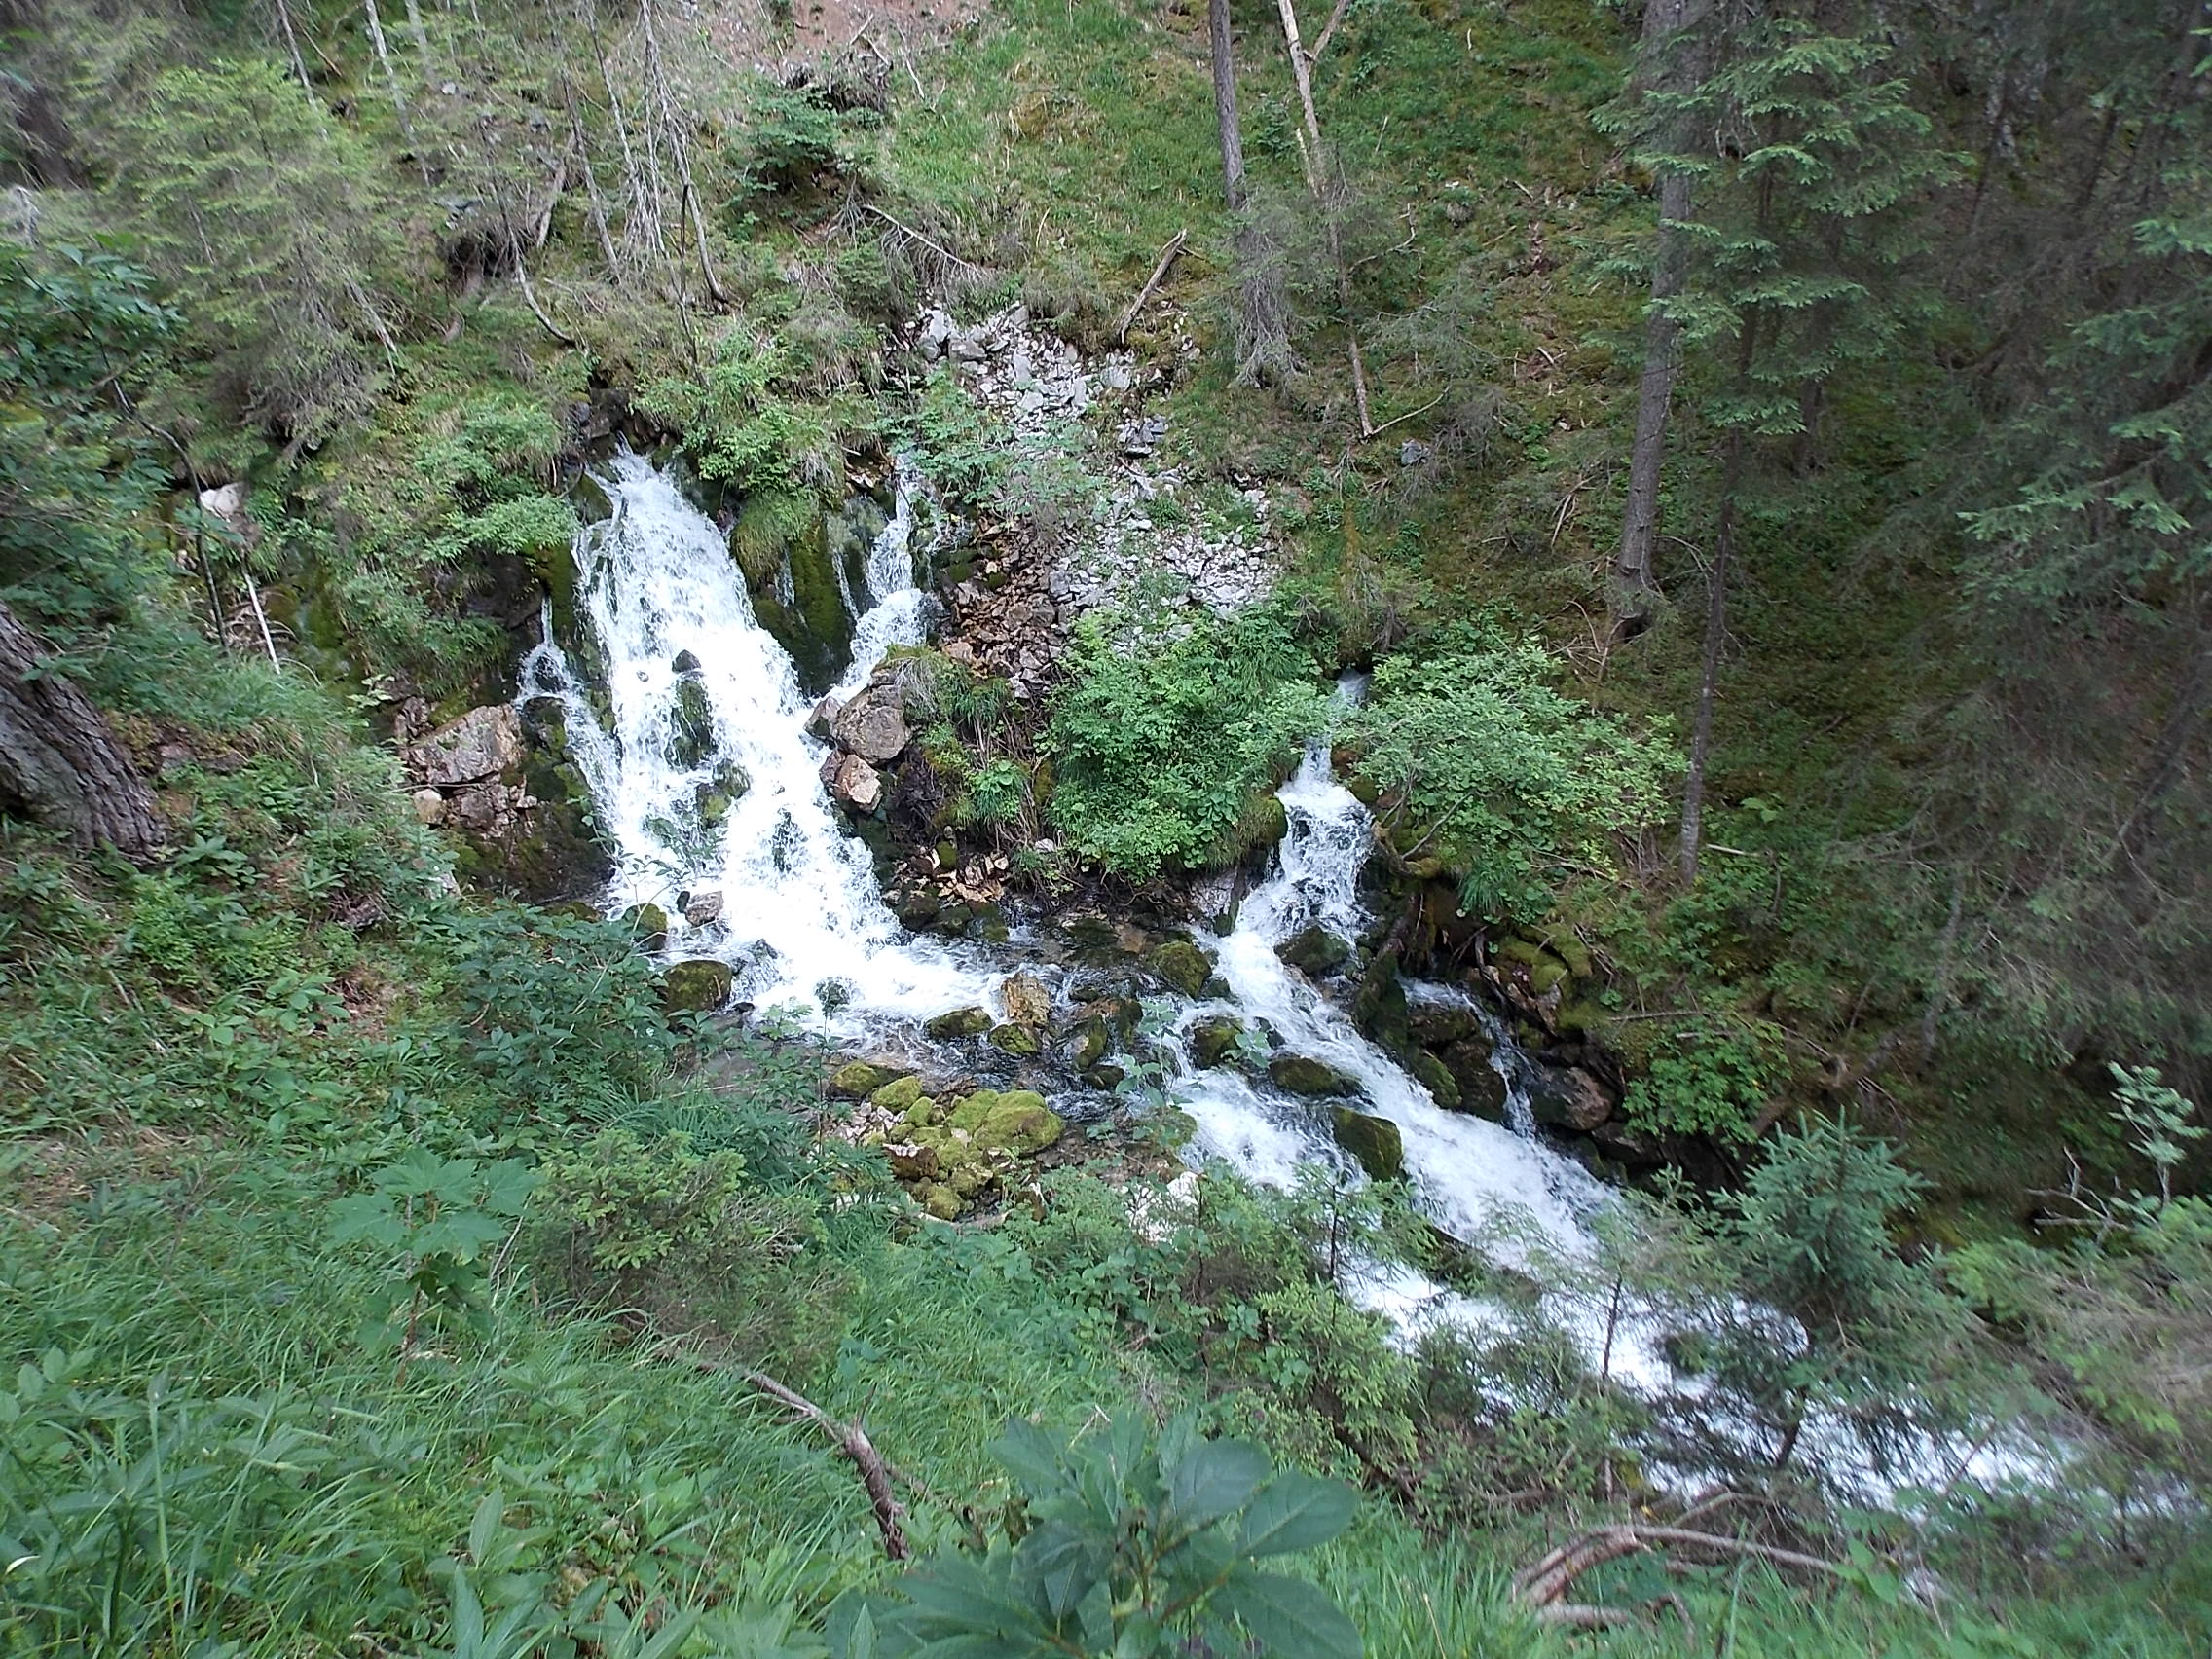 Doser Wasserfall Häselgehr Lechweg 8